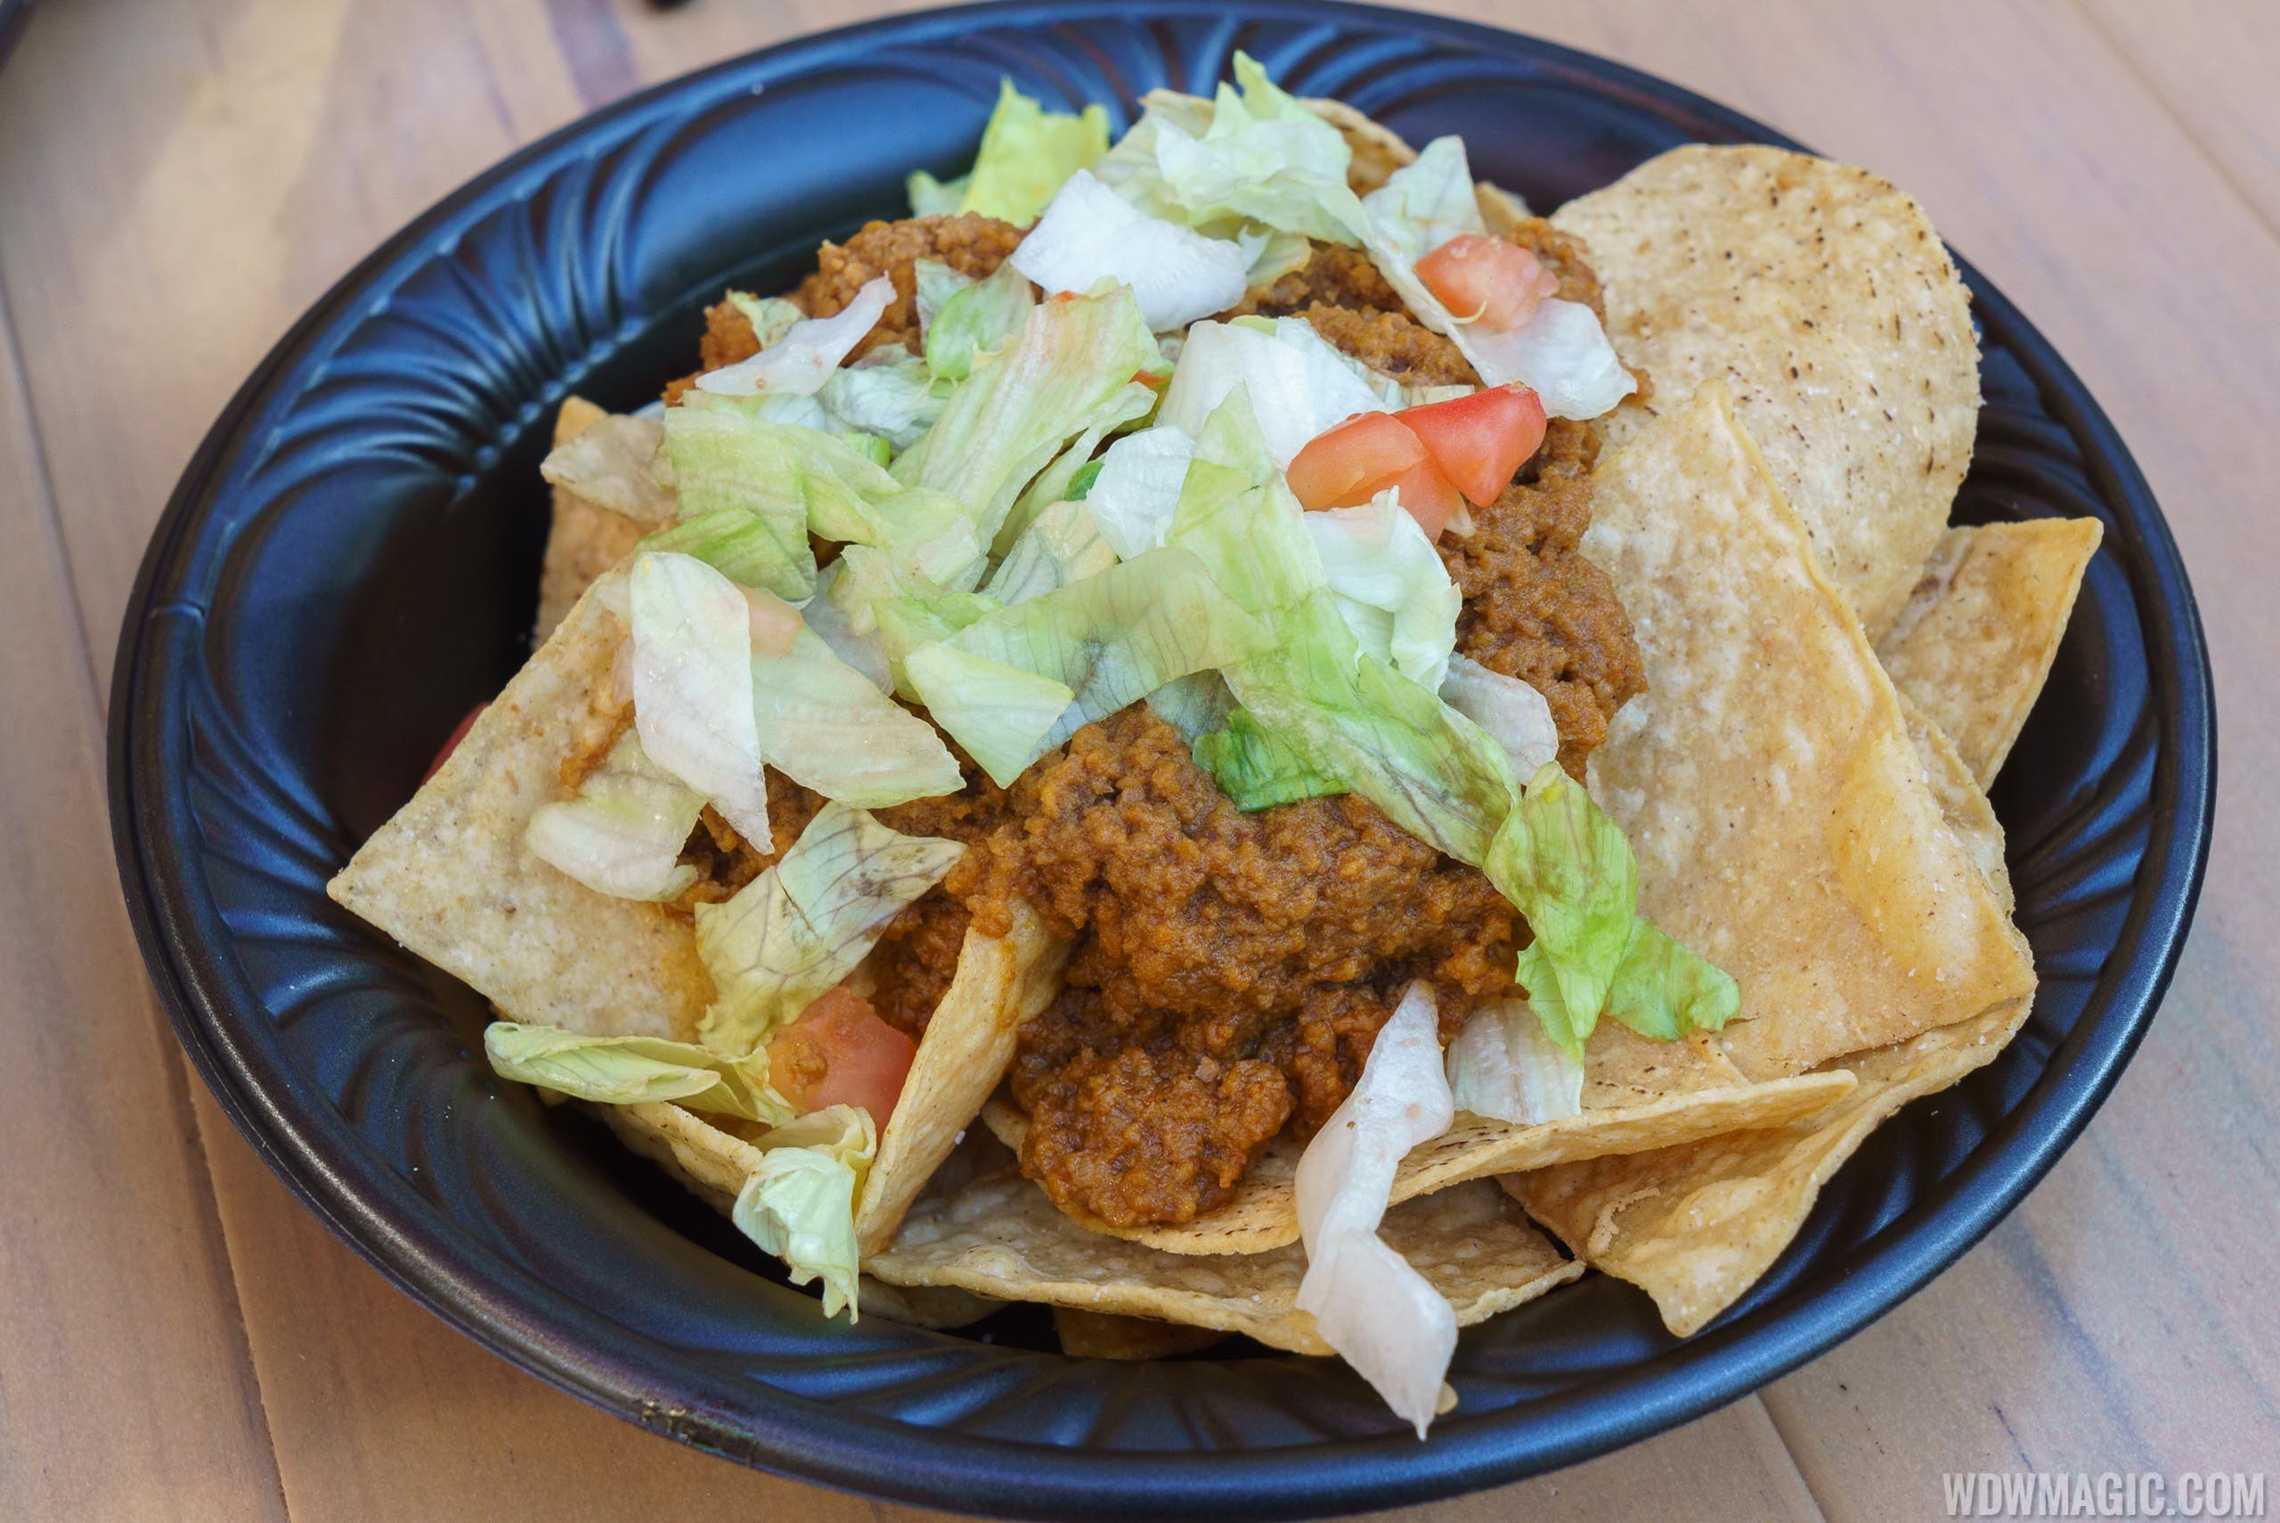 Pecos Bill Cafe Beef Nachos